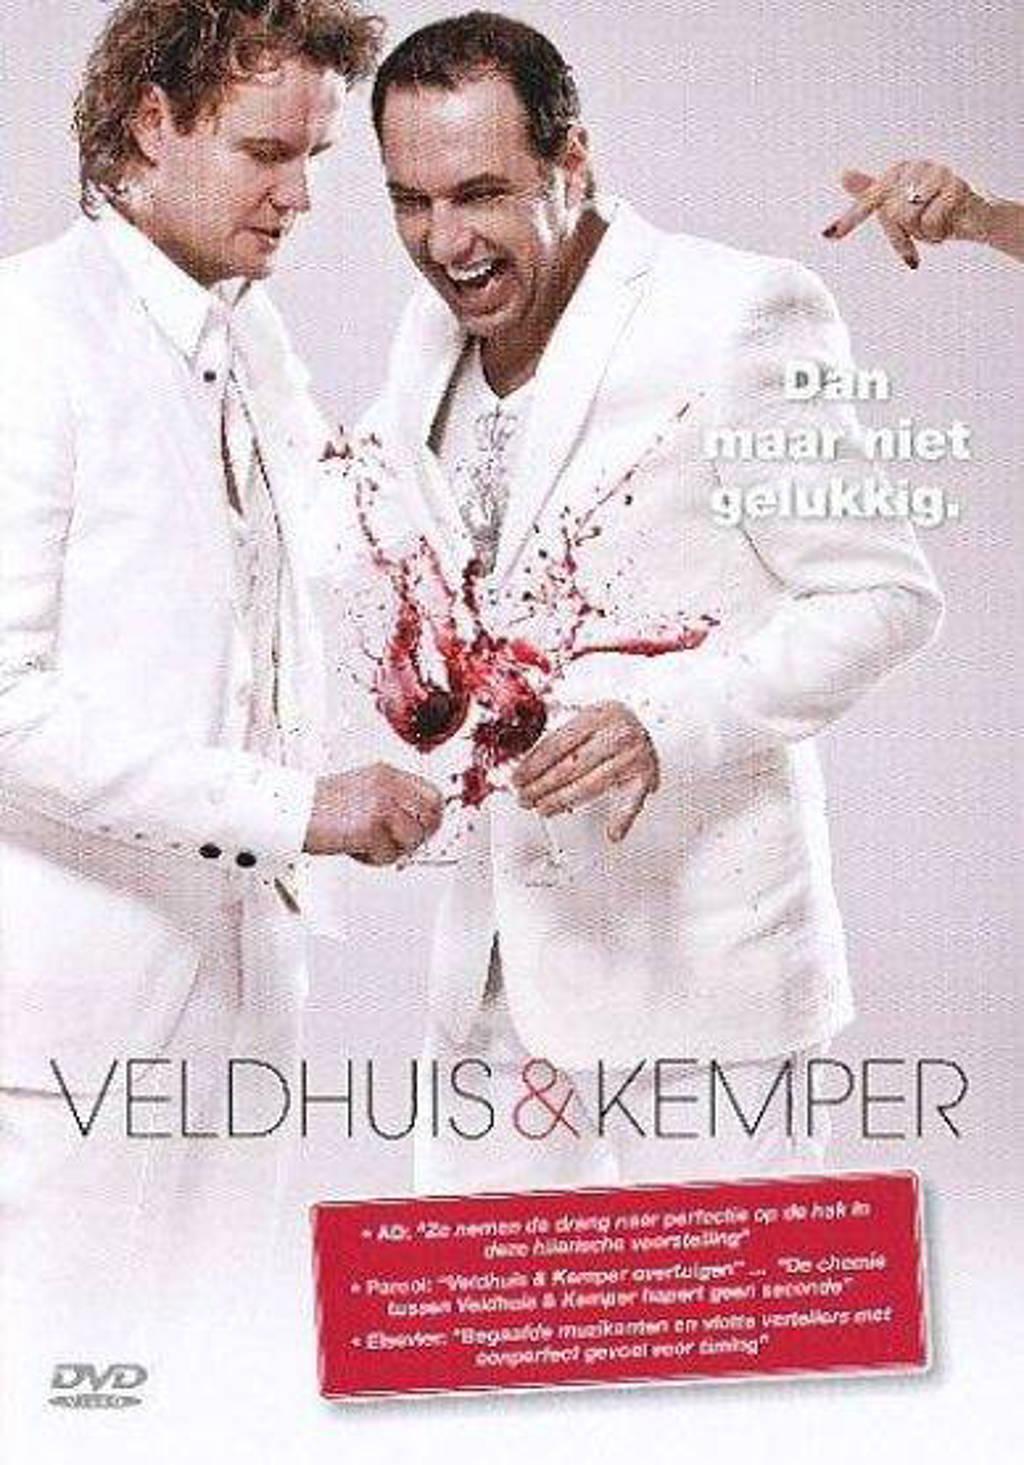 Veldhuis & Kemper - Dan maar niet gelukkig (DVD)